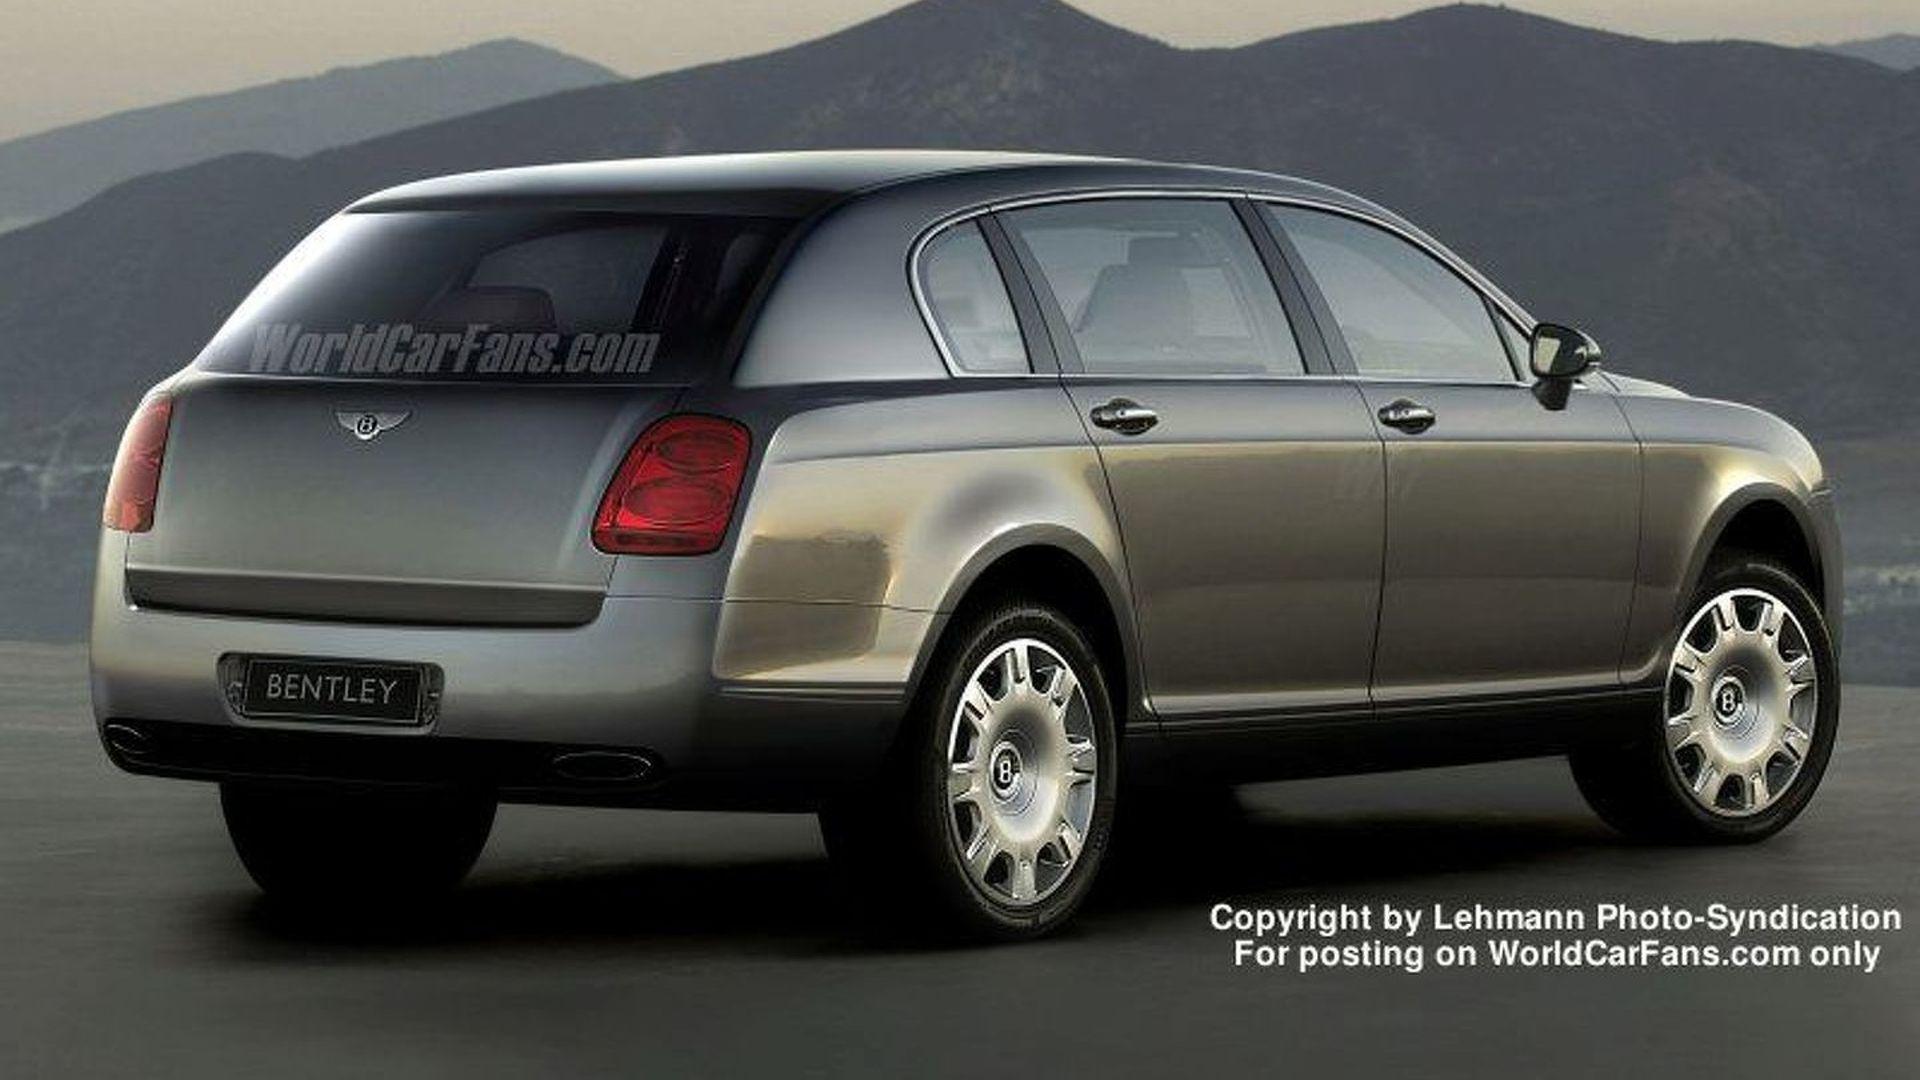 Spy Photos: More New Bentley 4x4